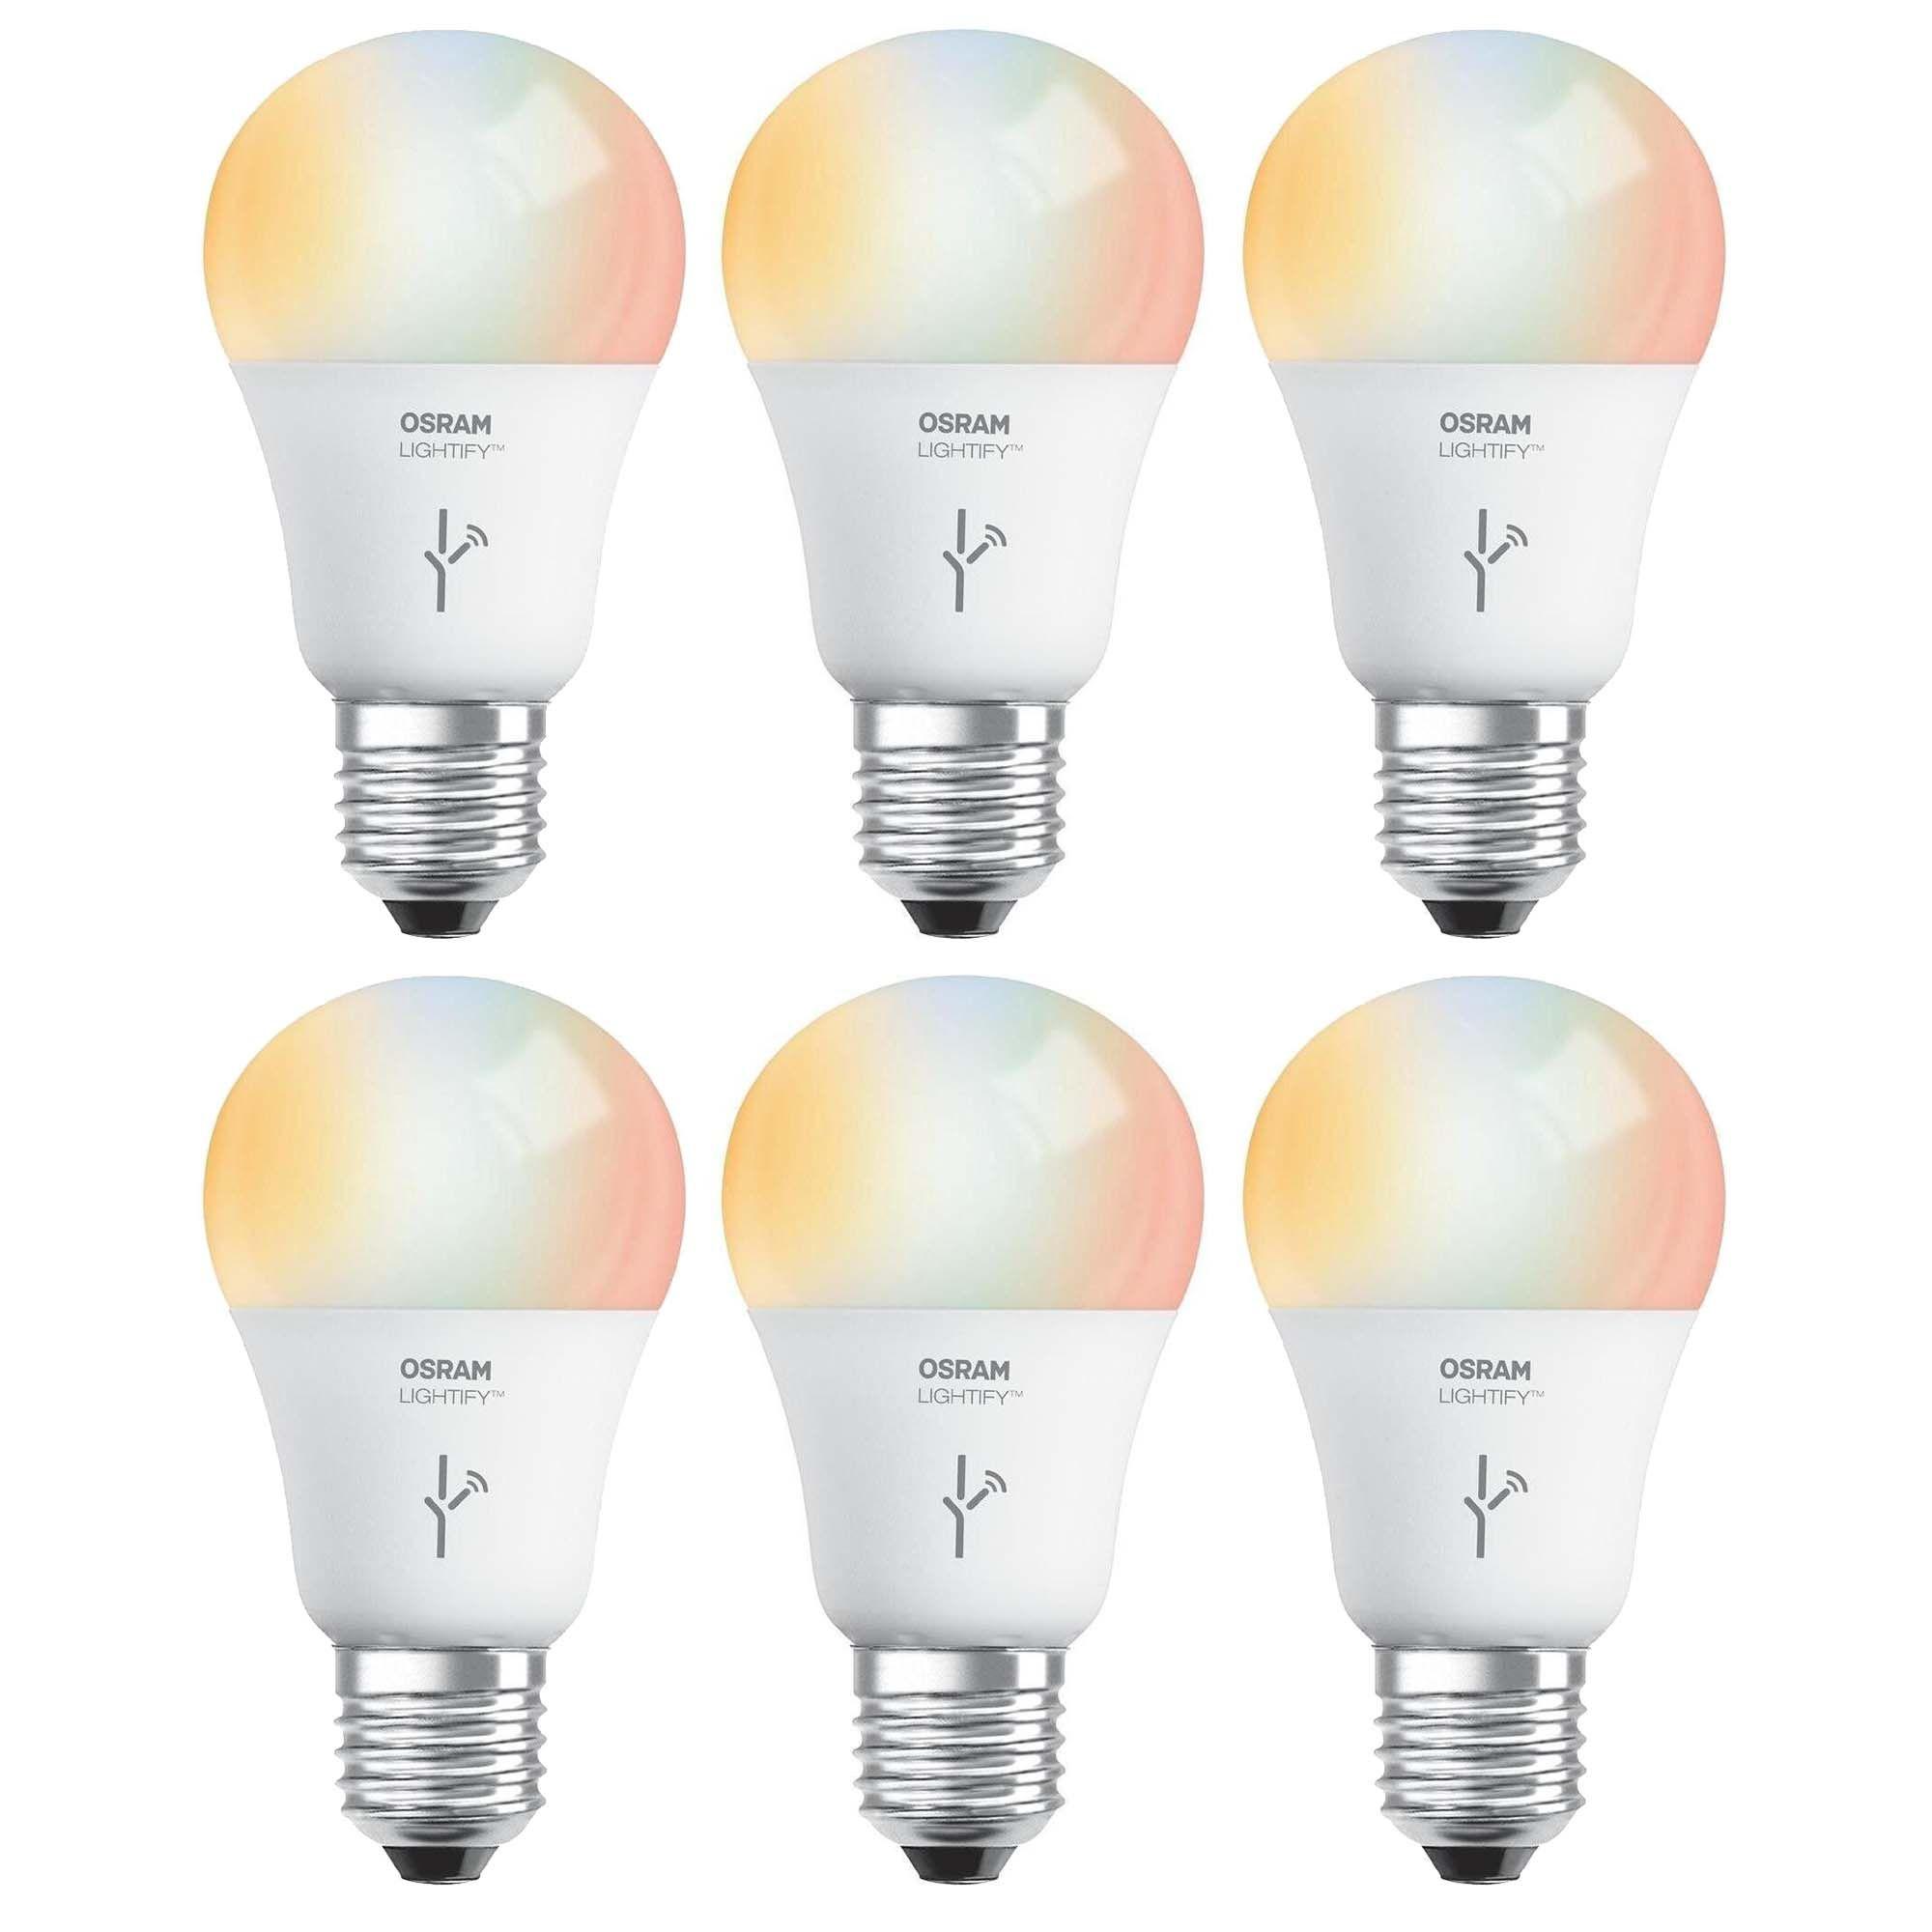 Sylvania Osram Lightify 60w A19 Daylight Rgb Smart Led Light Bulb 6 Pack New 1900 6500k Color Changing Works W Amazon A Light Bulb Led Light Bulb Bulb